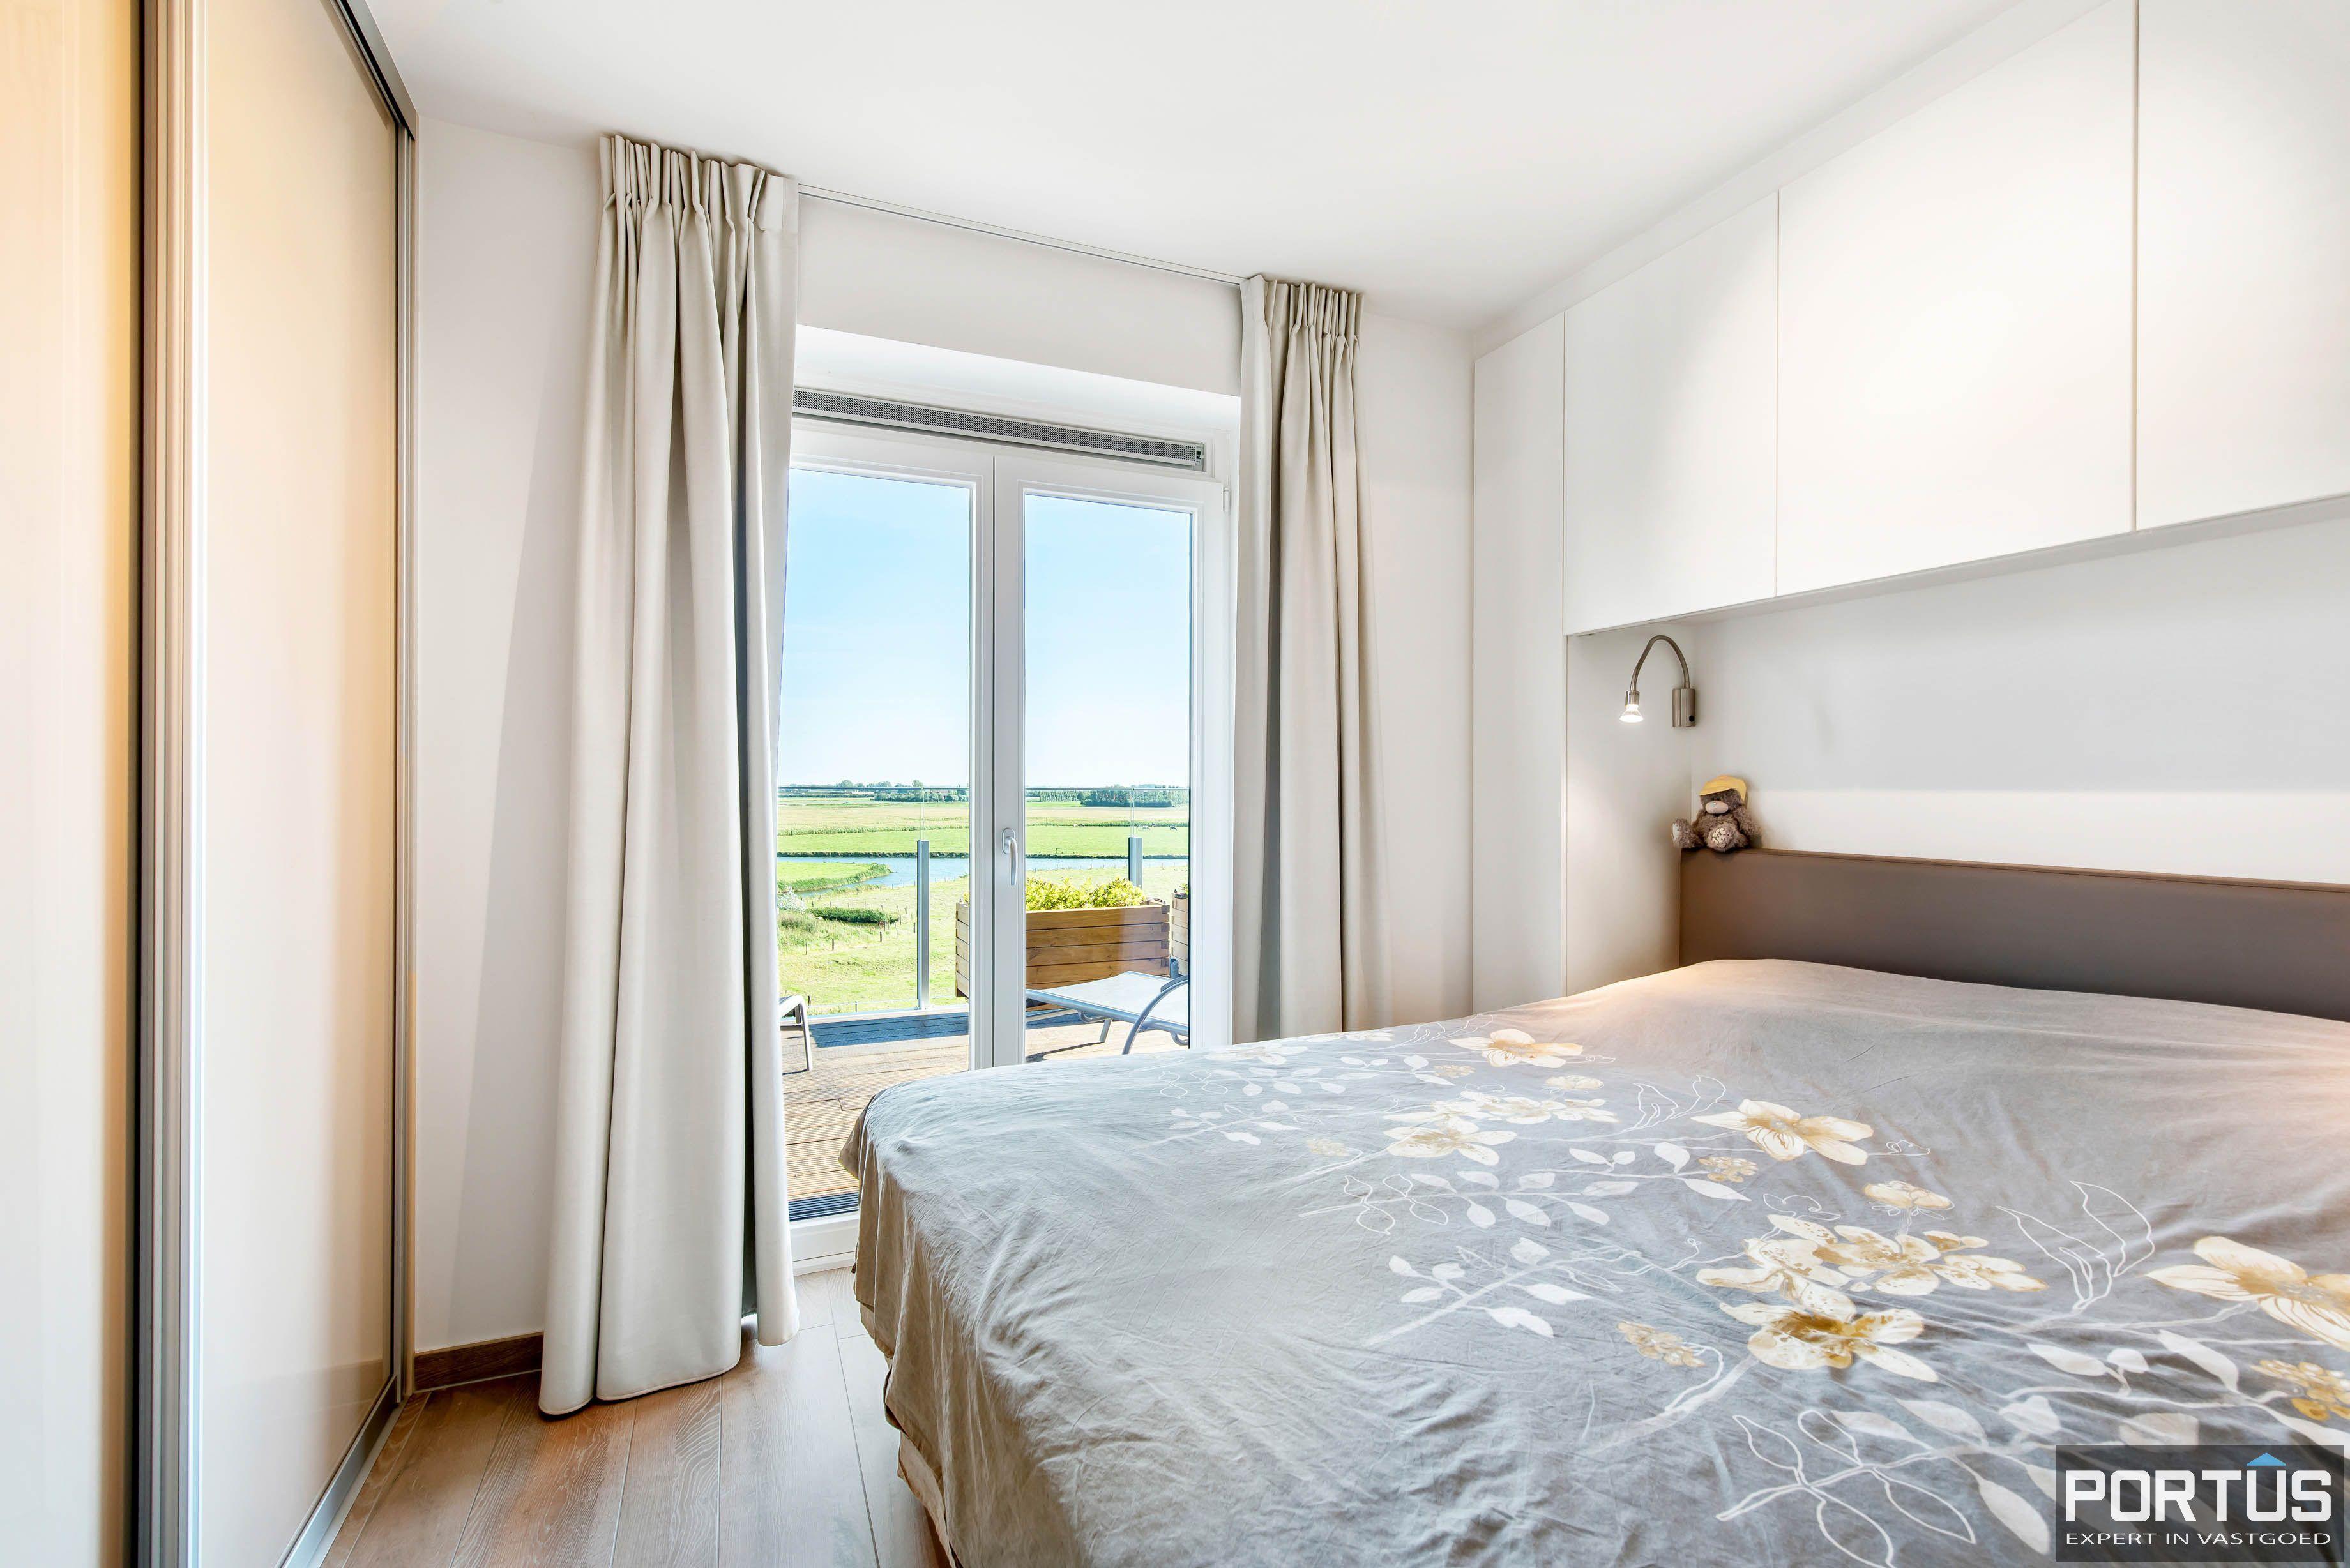 Exclusieve penthouse met 3 slaapkamers te koop te Nieuwpoort - 10927